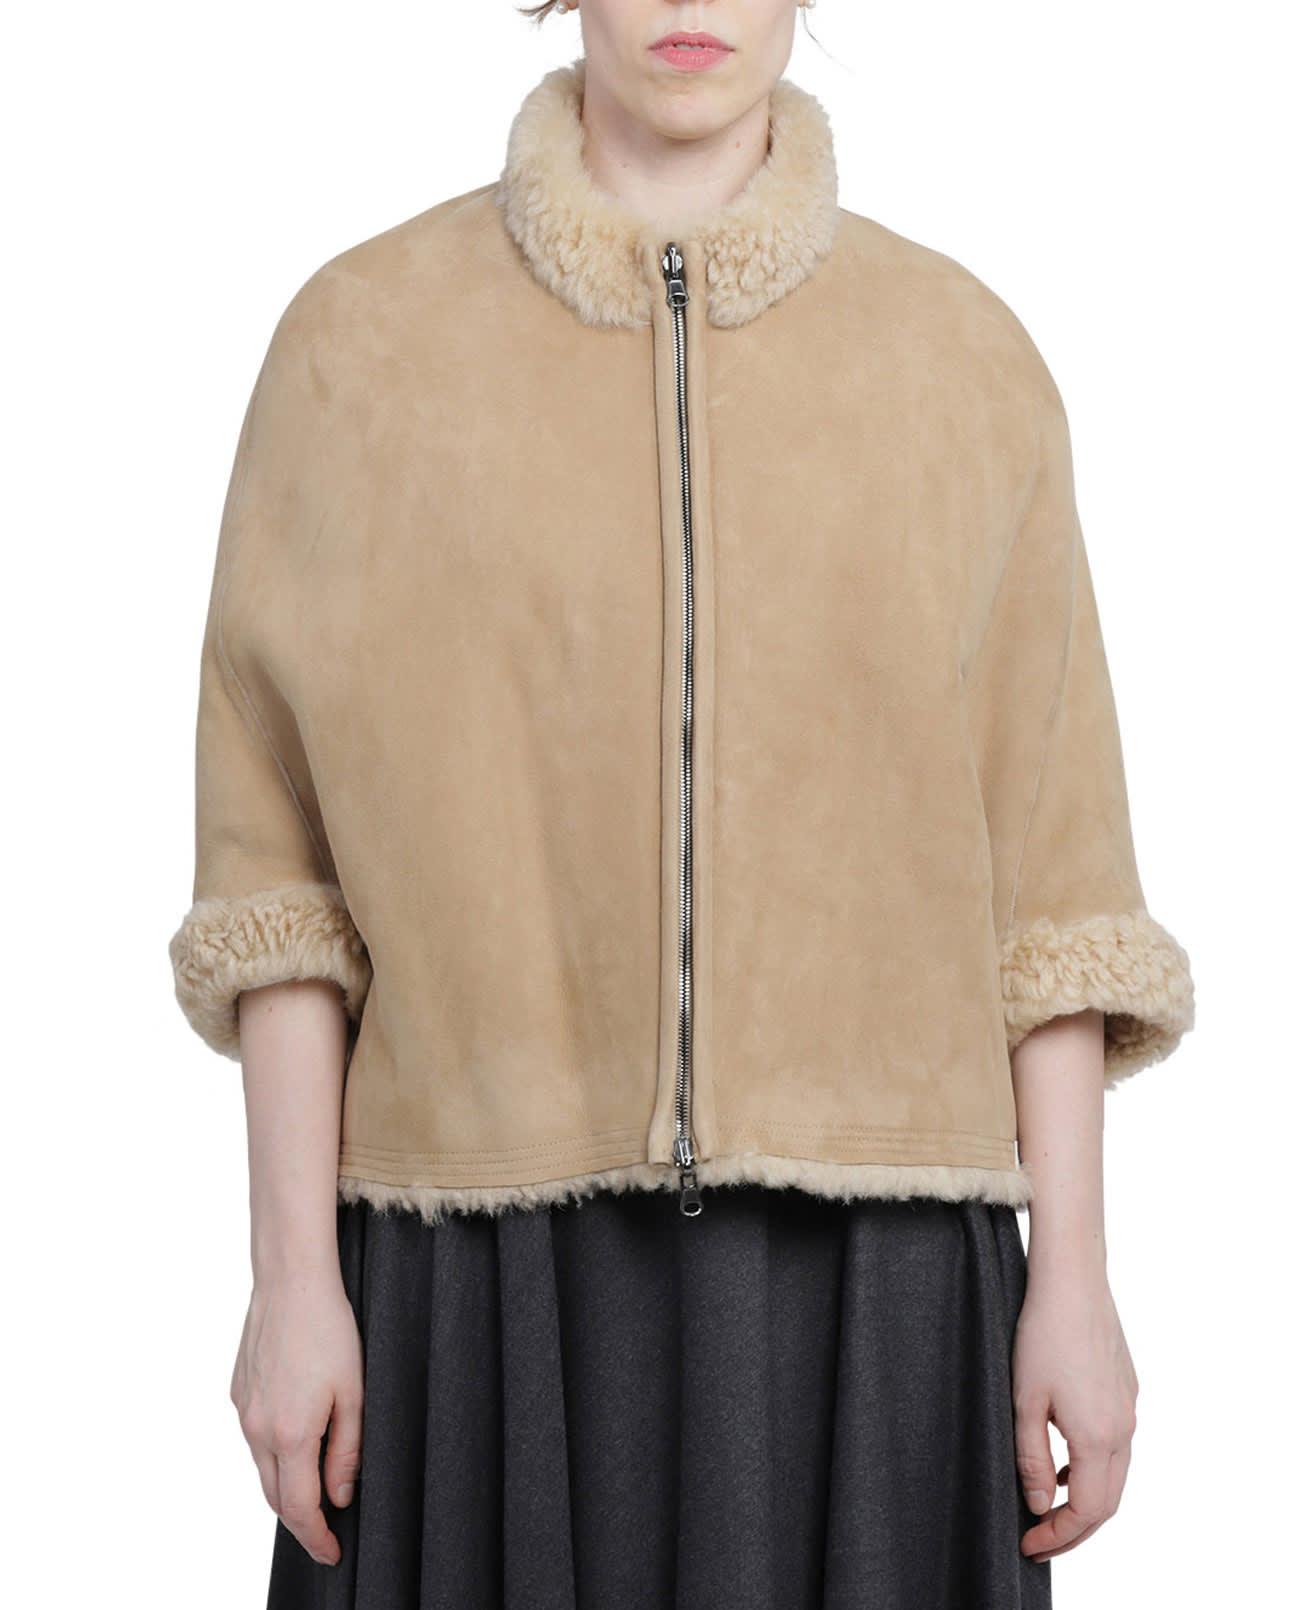 Portofino Beige Shearling Jacket